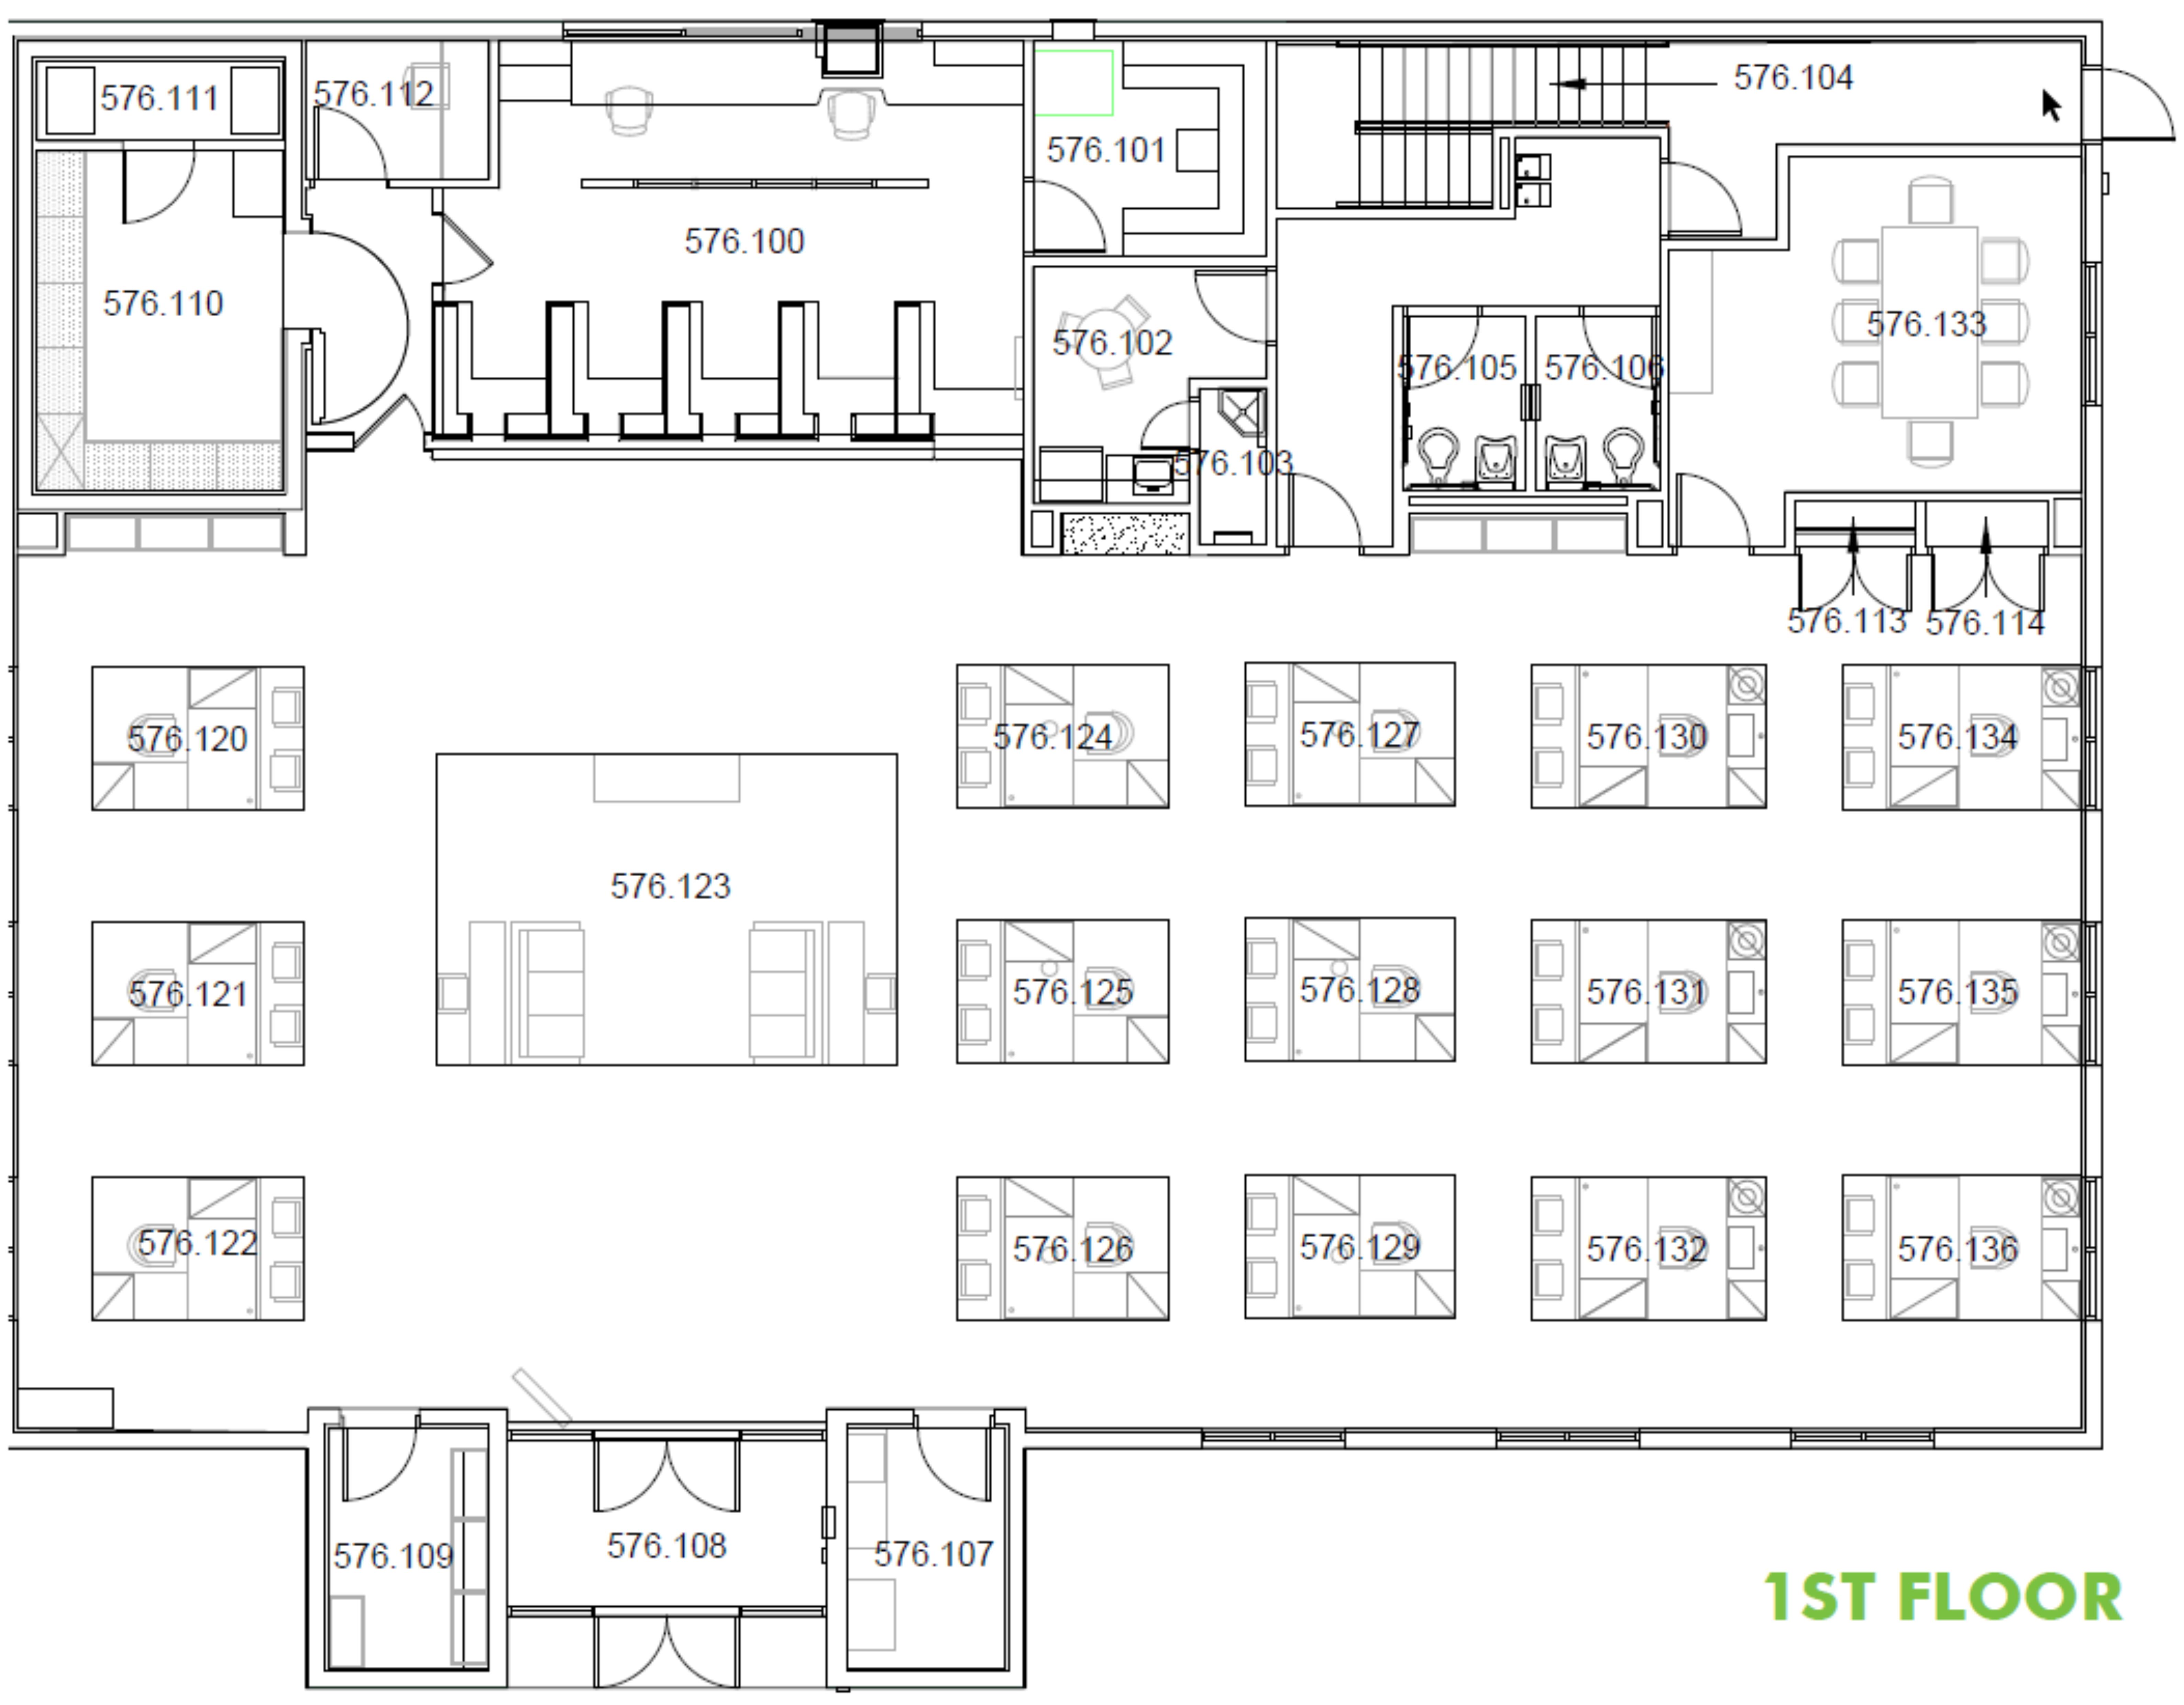 9561 W. 171st Street at Lagrange Rd.: site plan